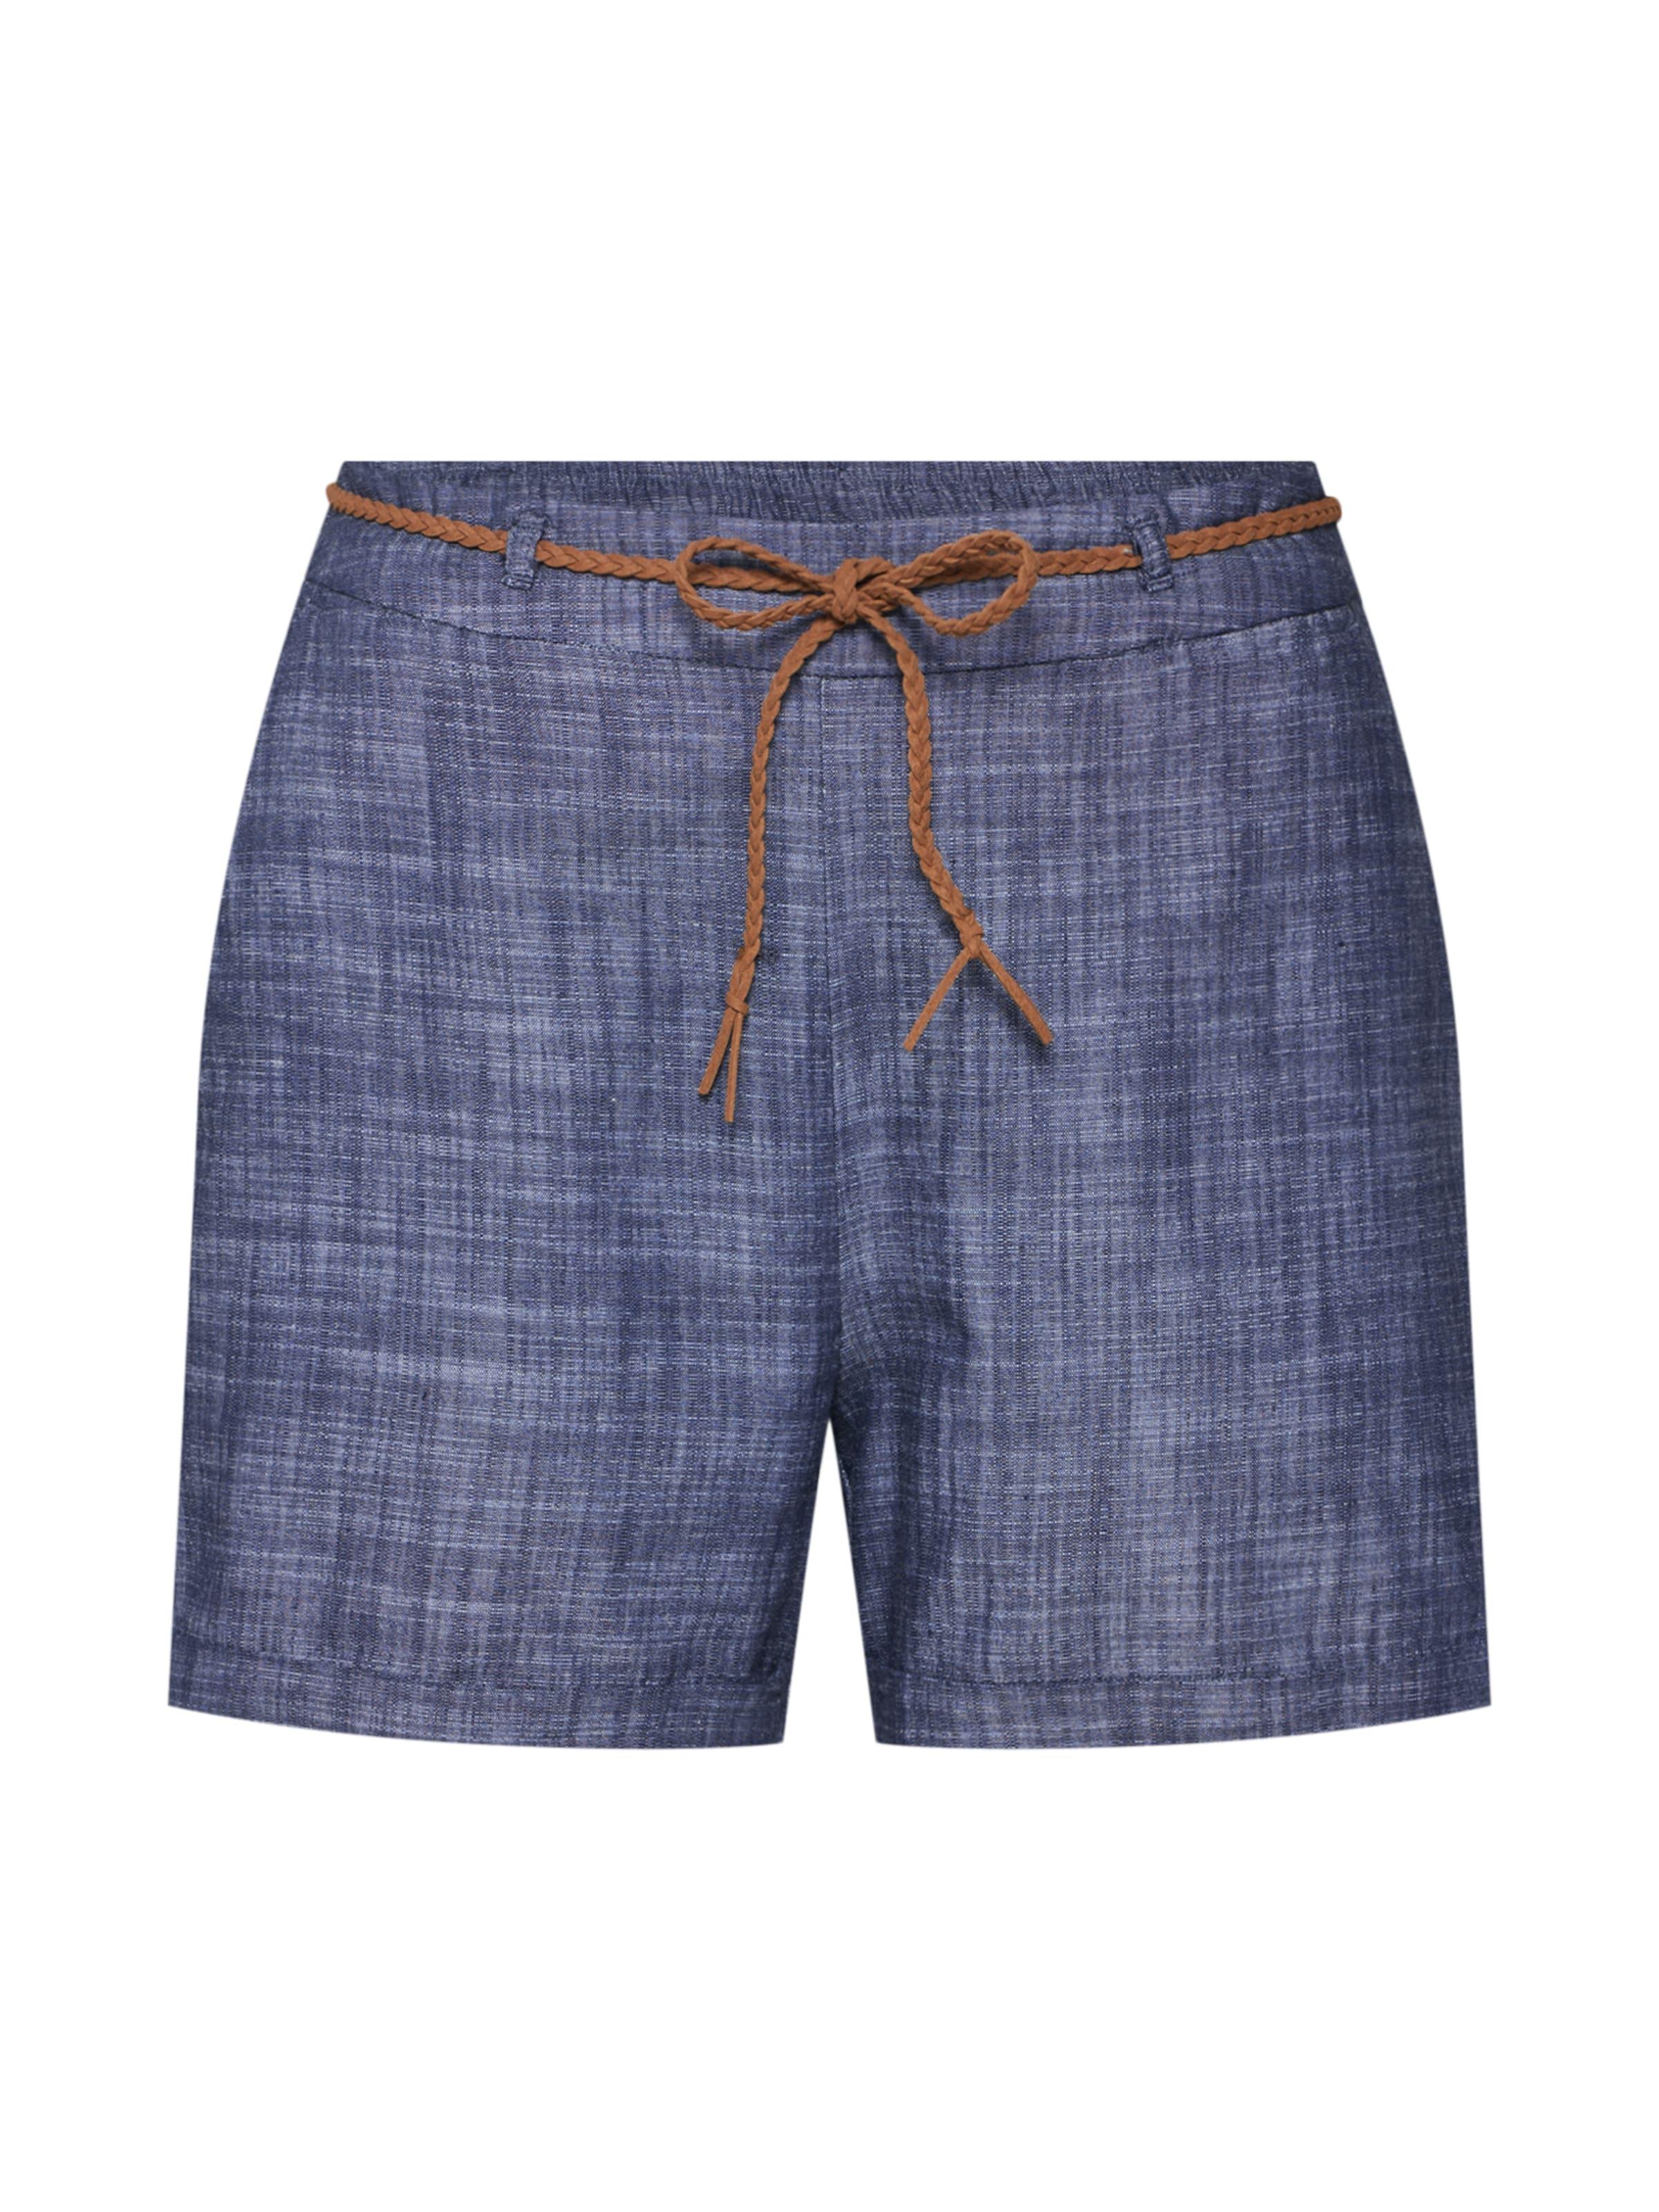 Belt Bleu Jacqueline De Yong En Marine Shorts' 'lucky Pantalon dBxoerC